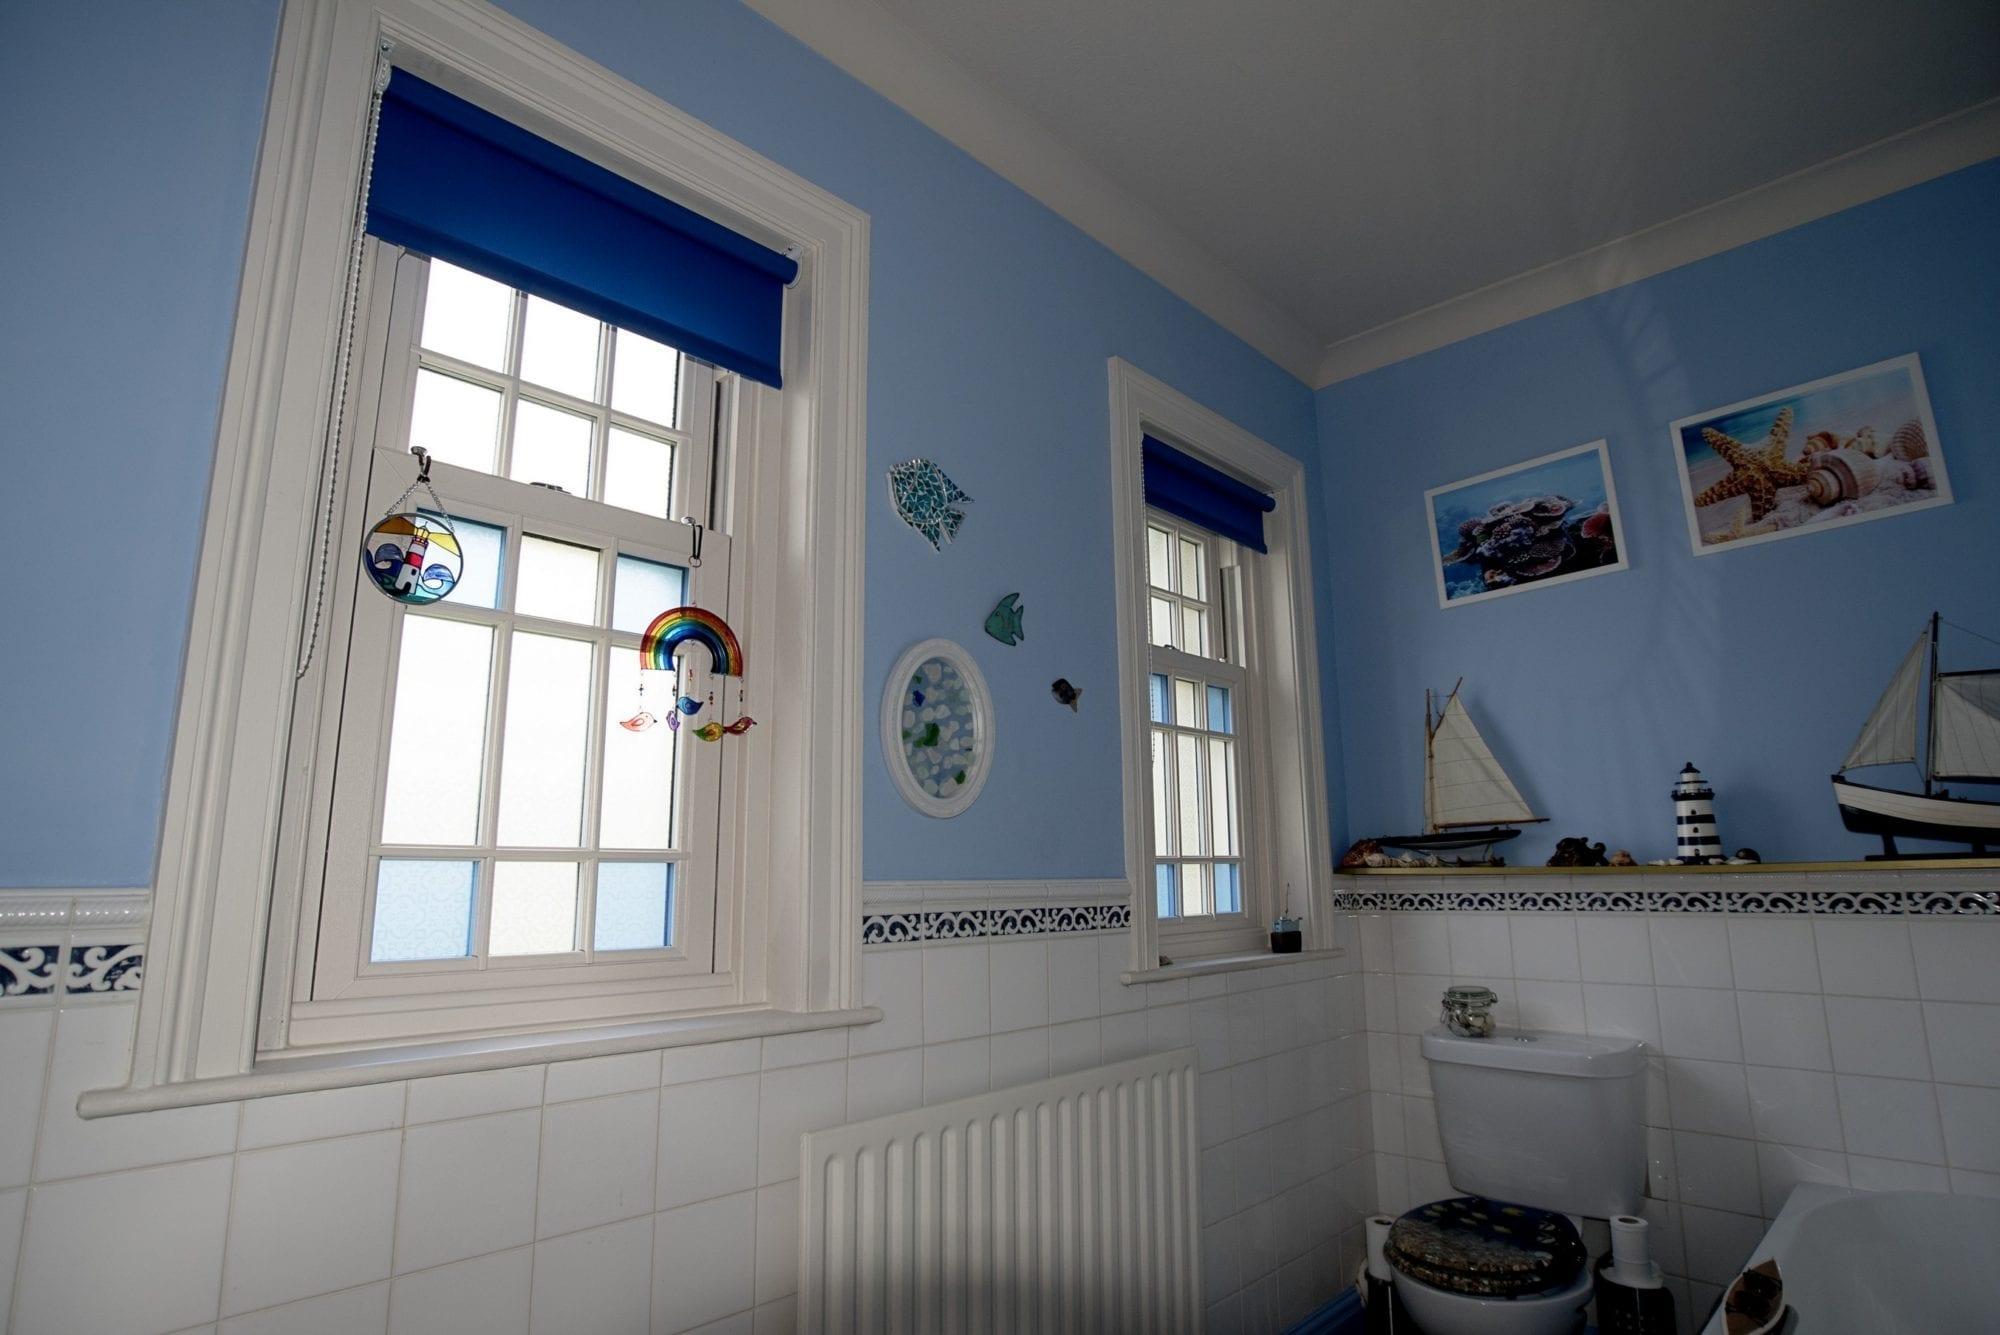 Sash Windows in Bathroom